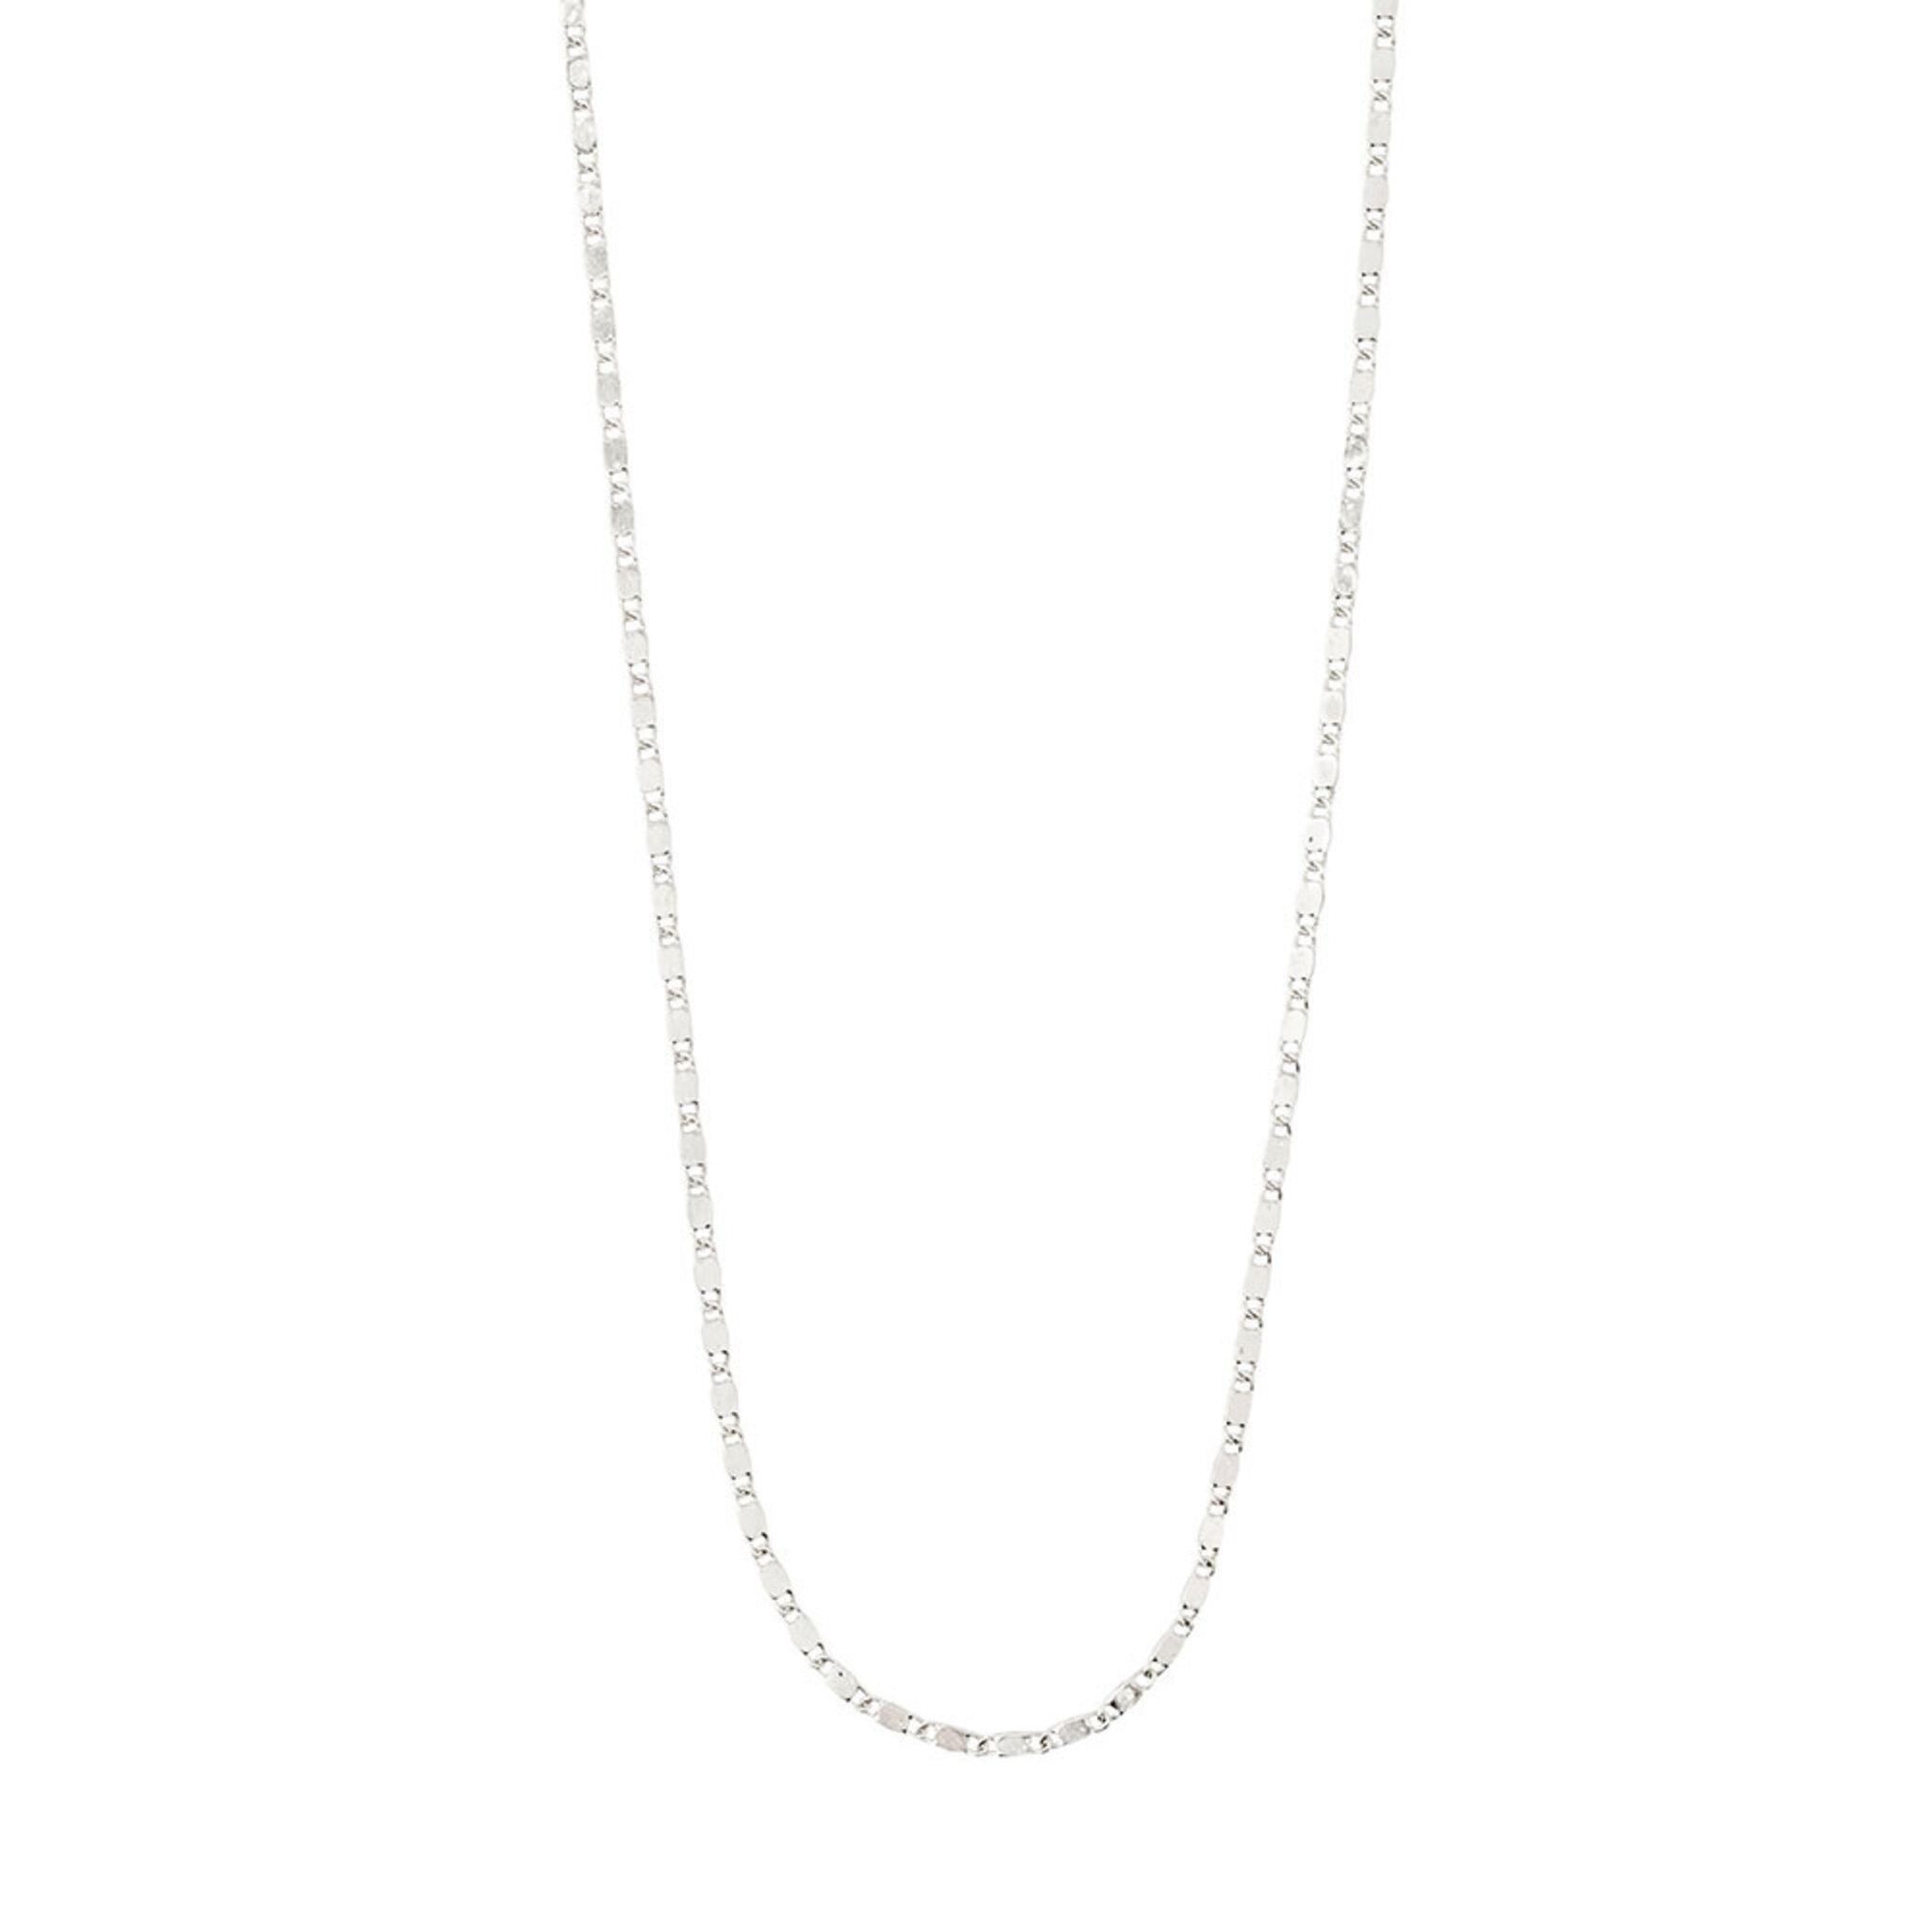 Halsband Parisa, ONE SIZE